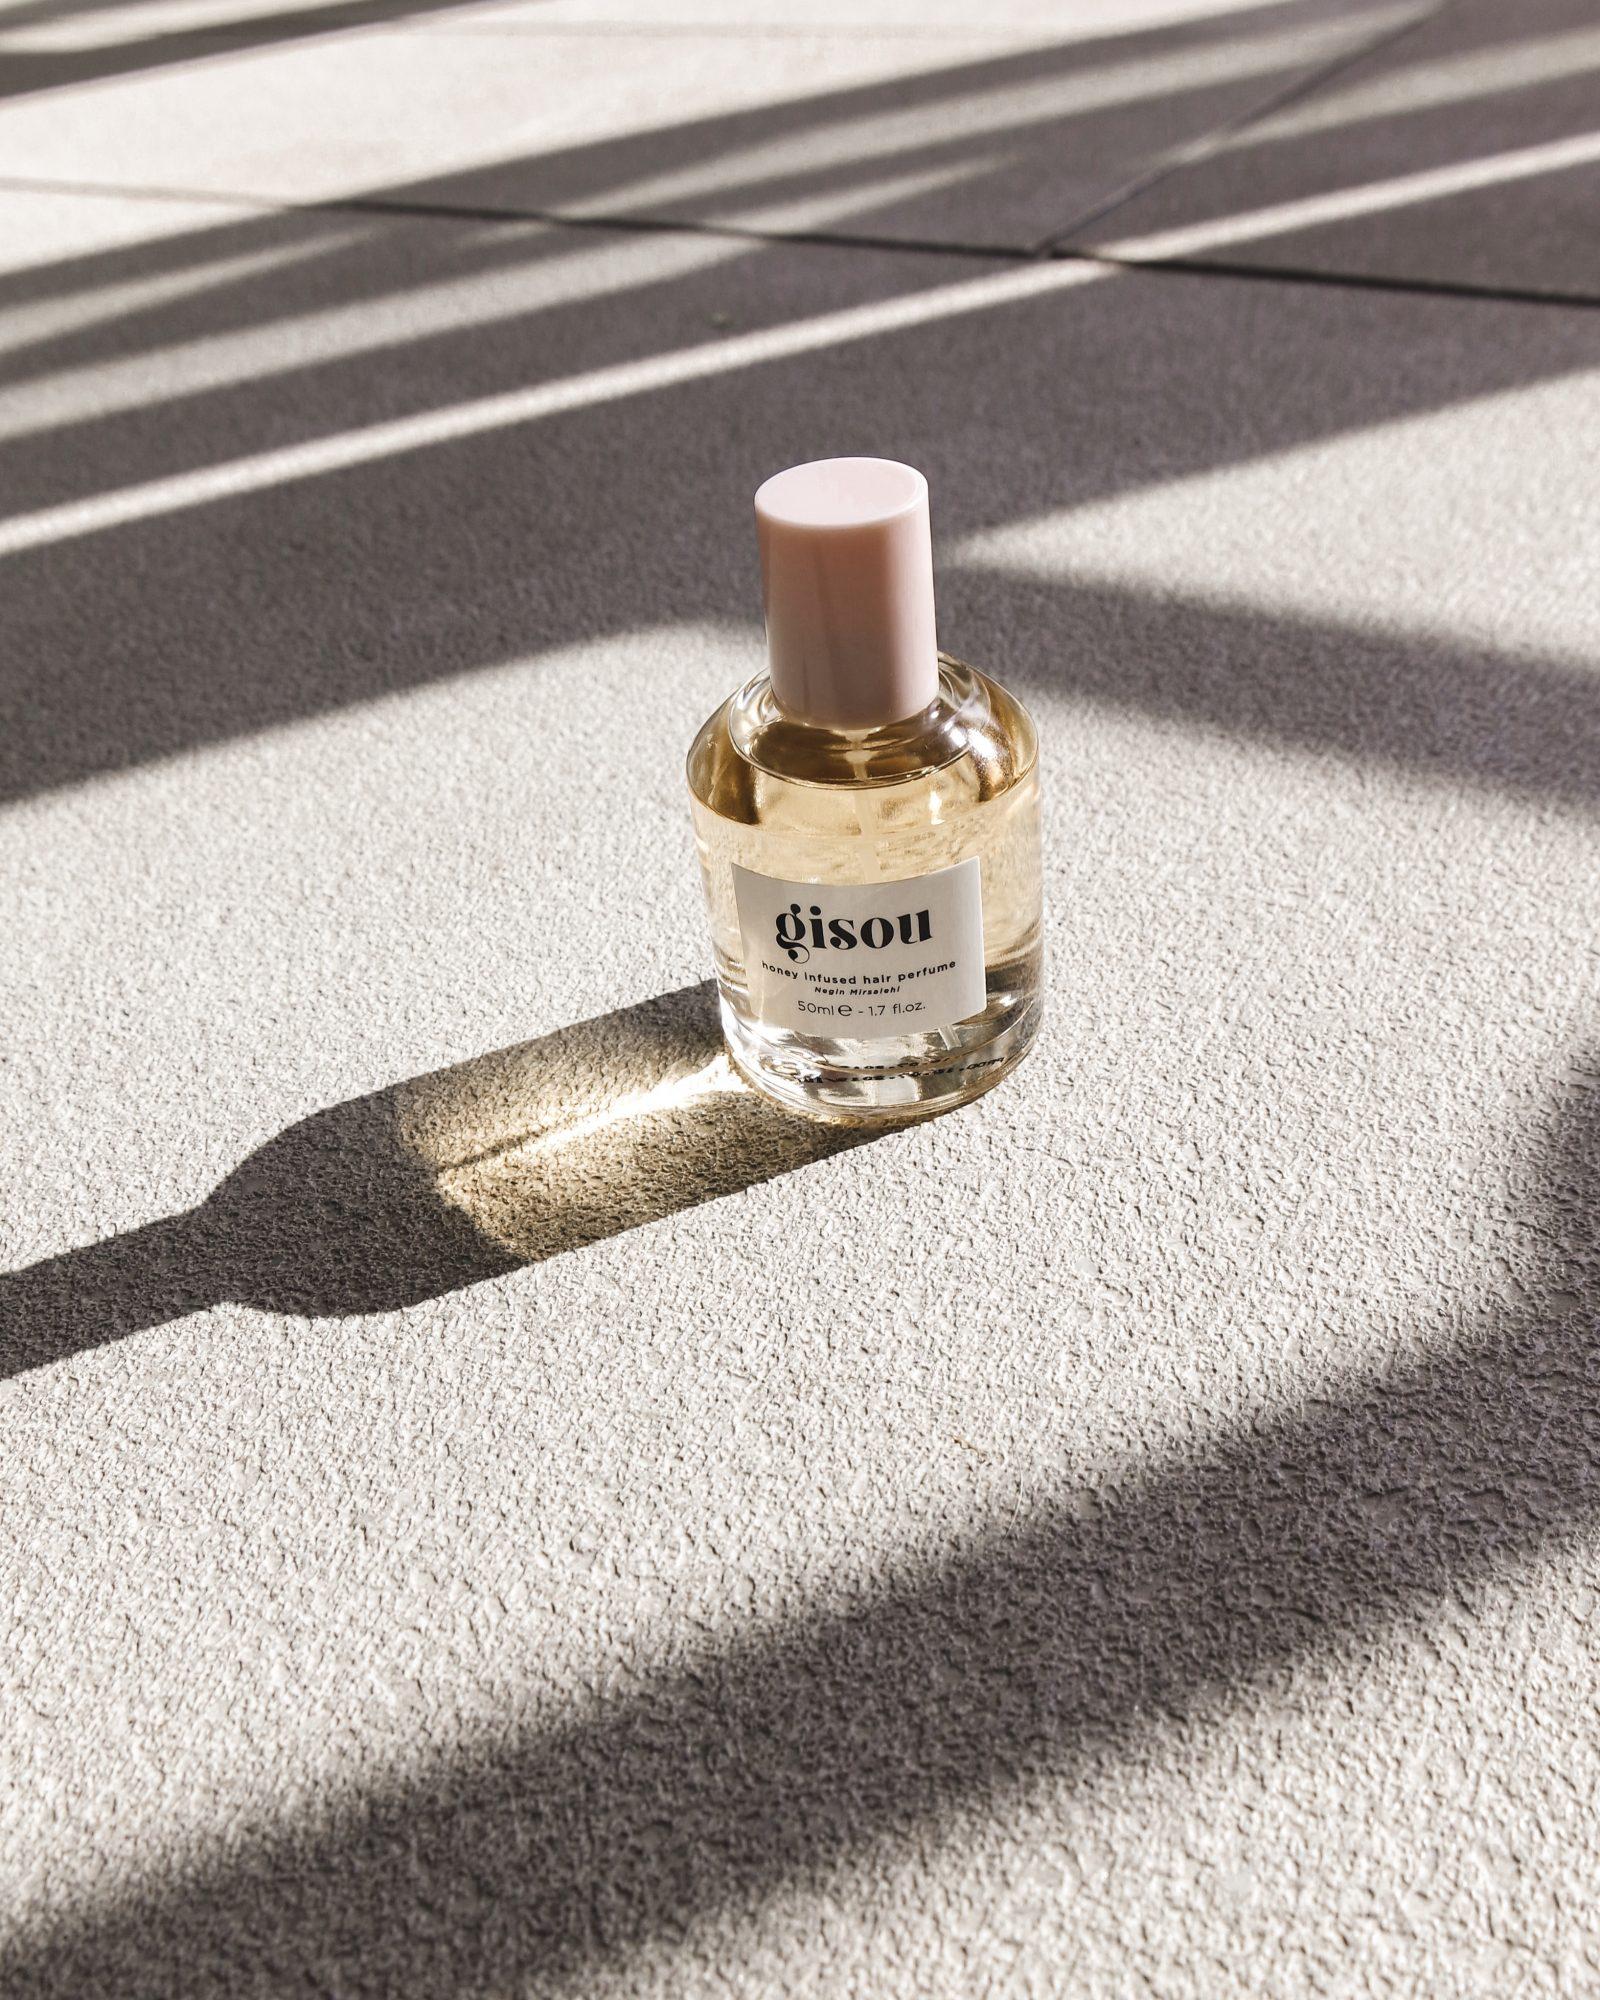 GISOU Hair Perfume